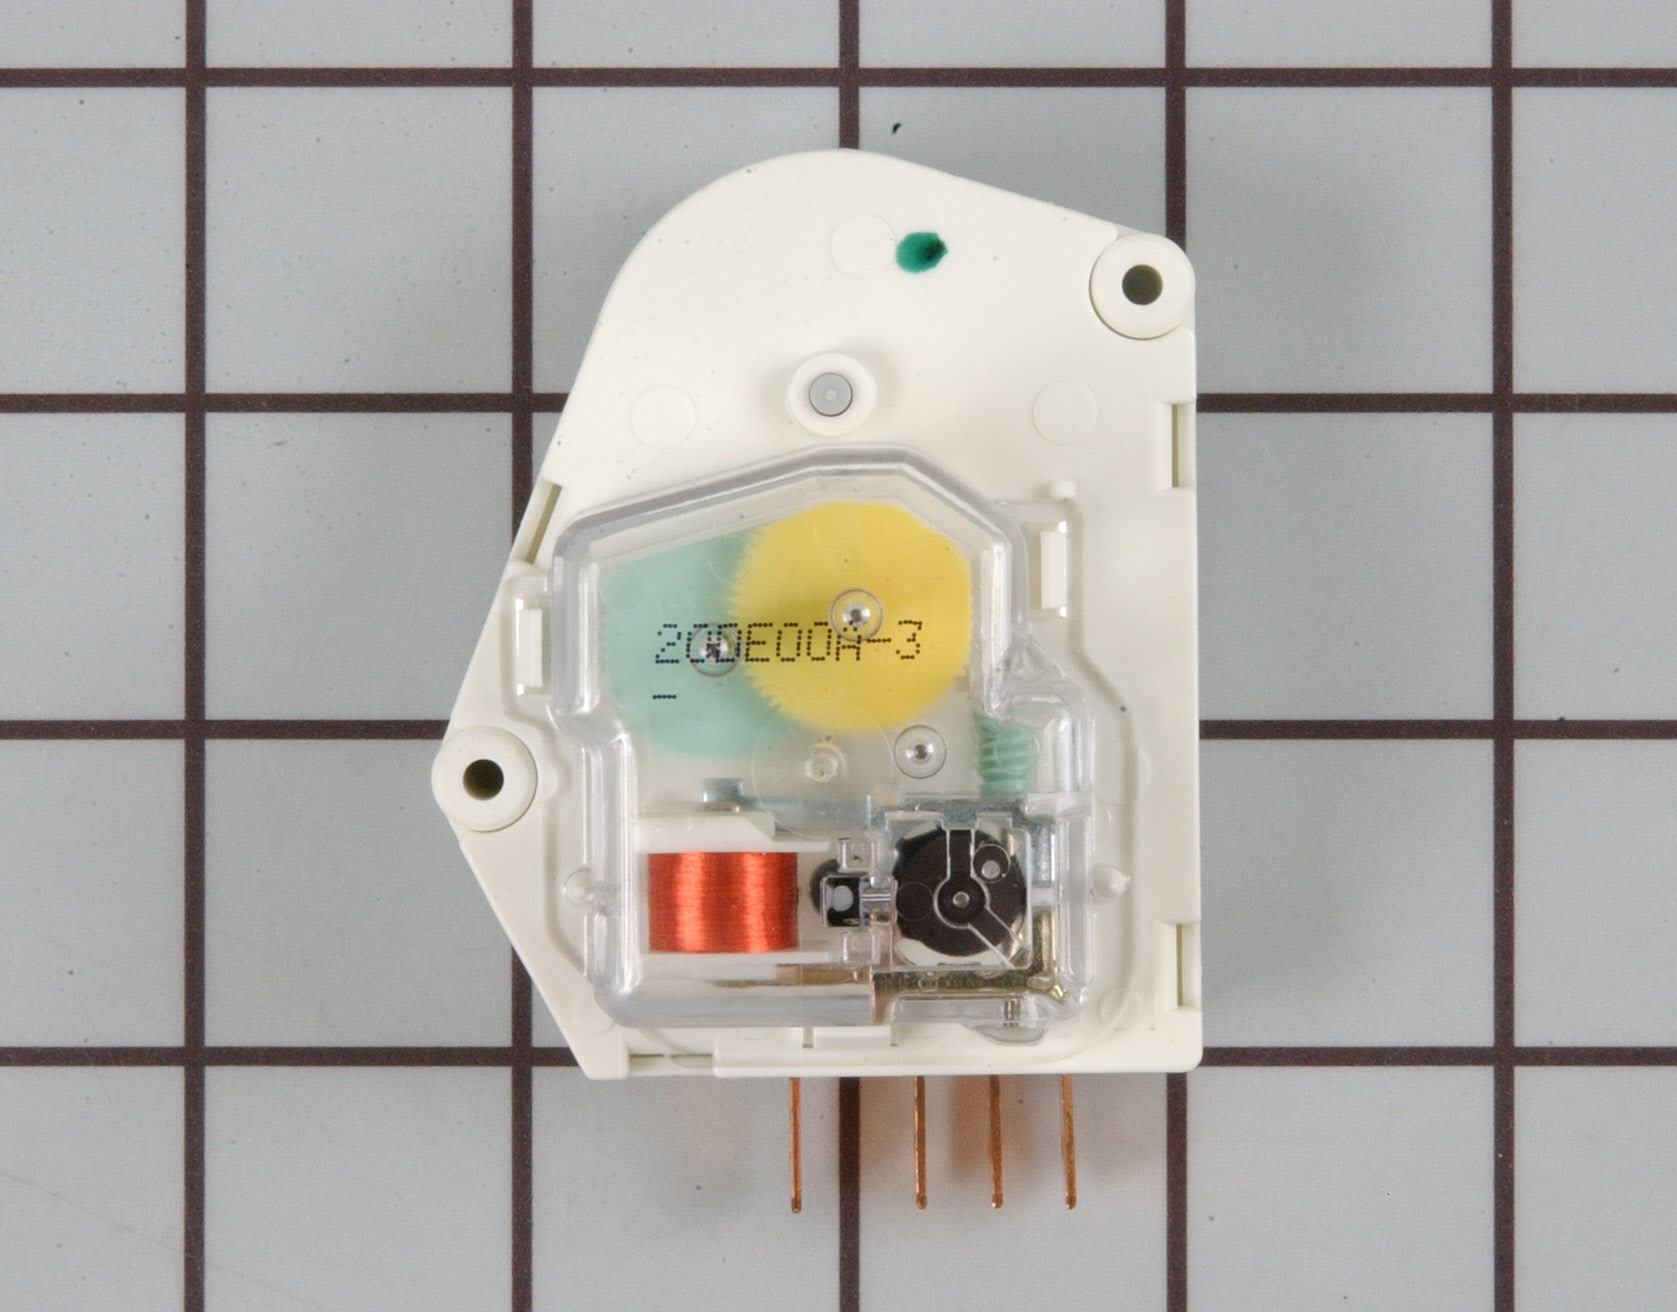 SPM6823-3 Refrigerator Defrost Timer for WP68233-3 AP6010564 PS11743747